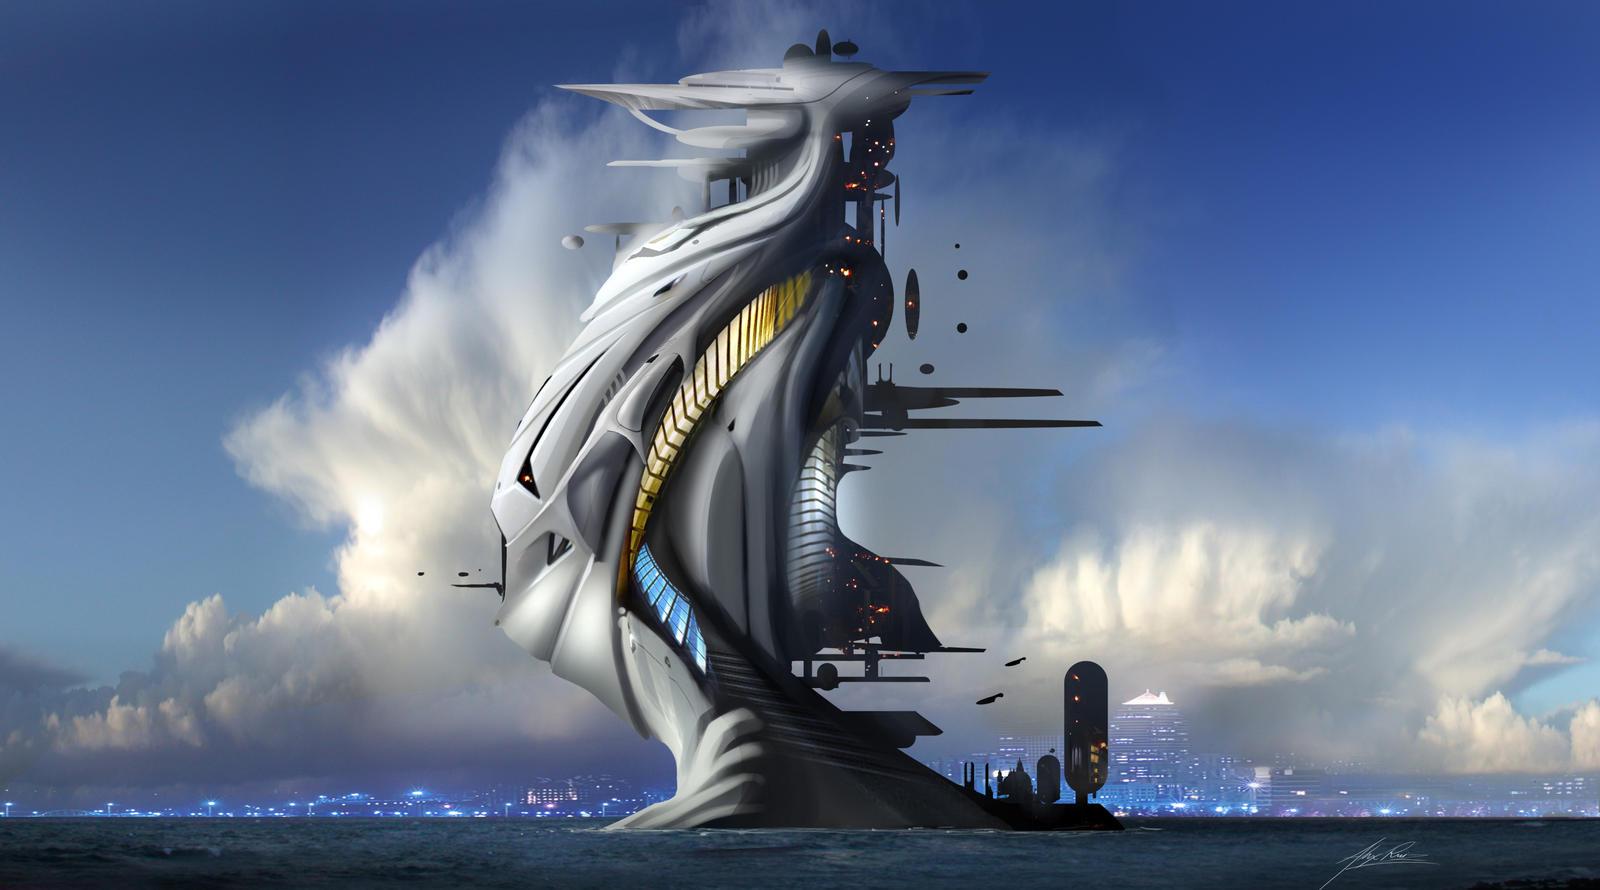 Future architecture by alexruizart